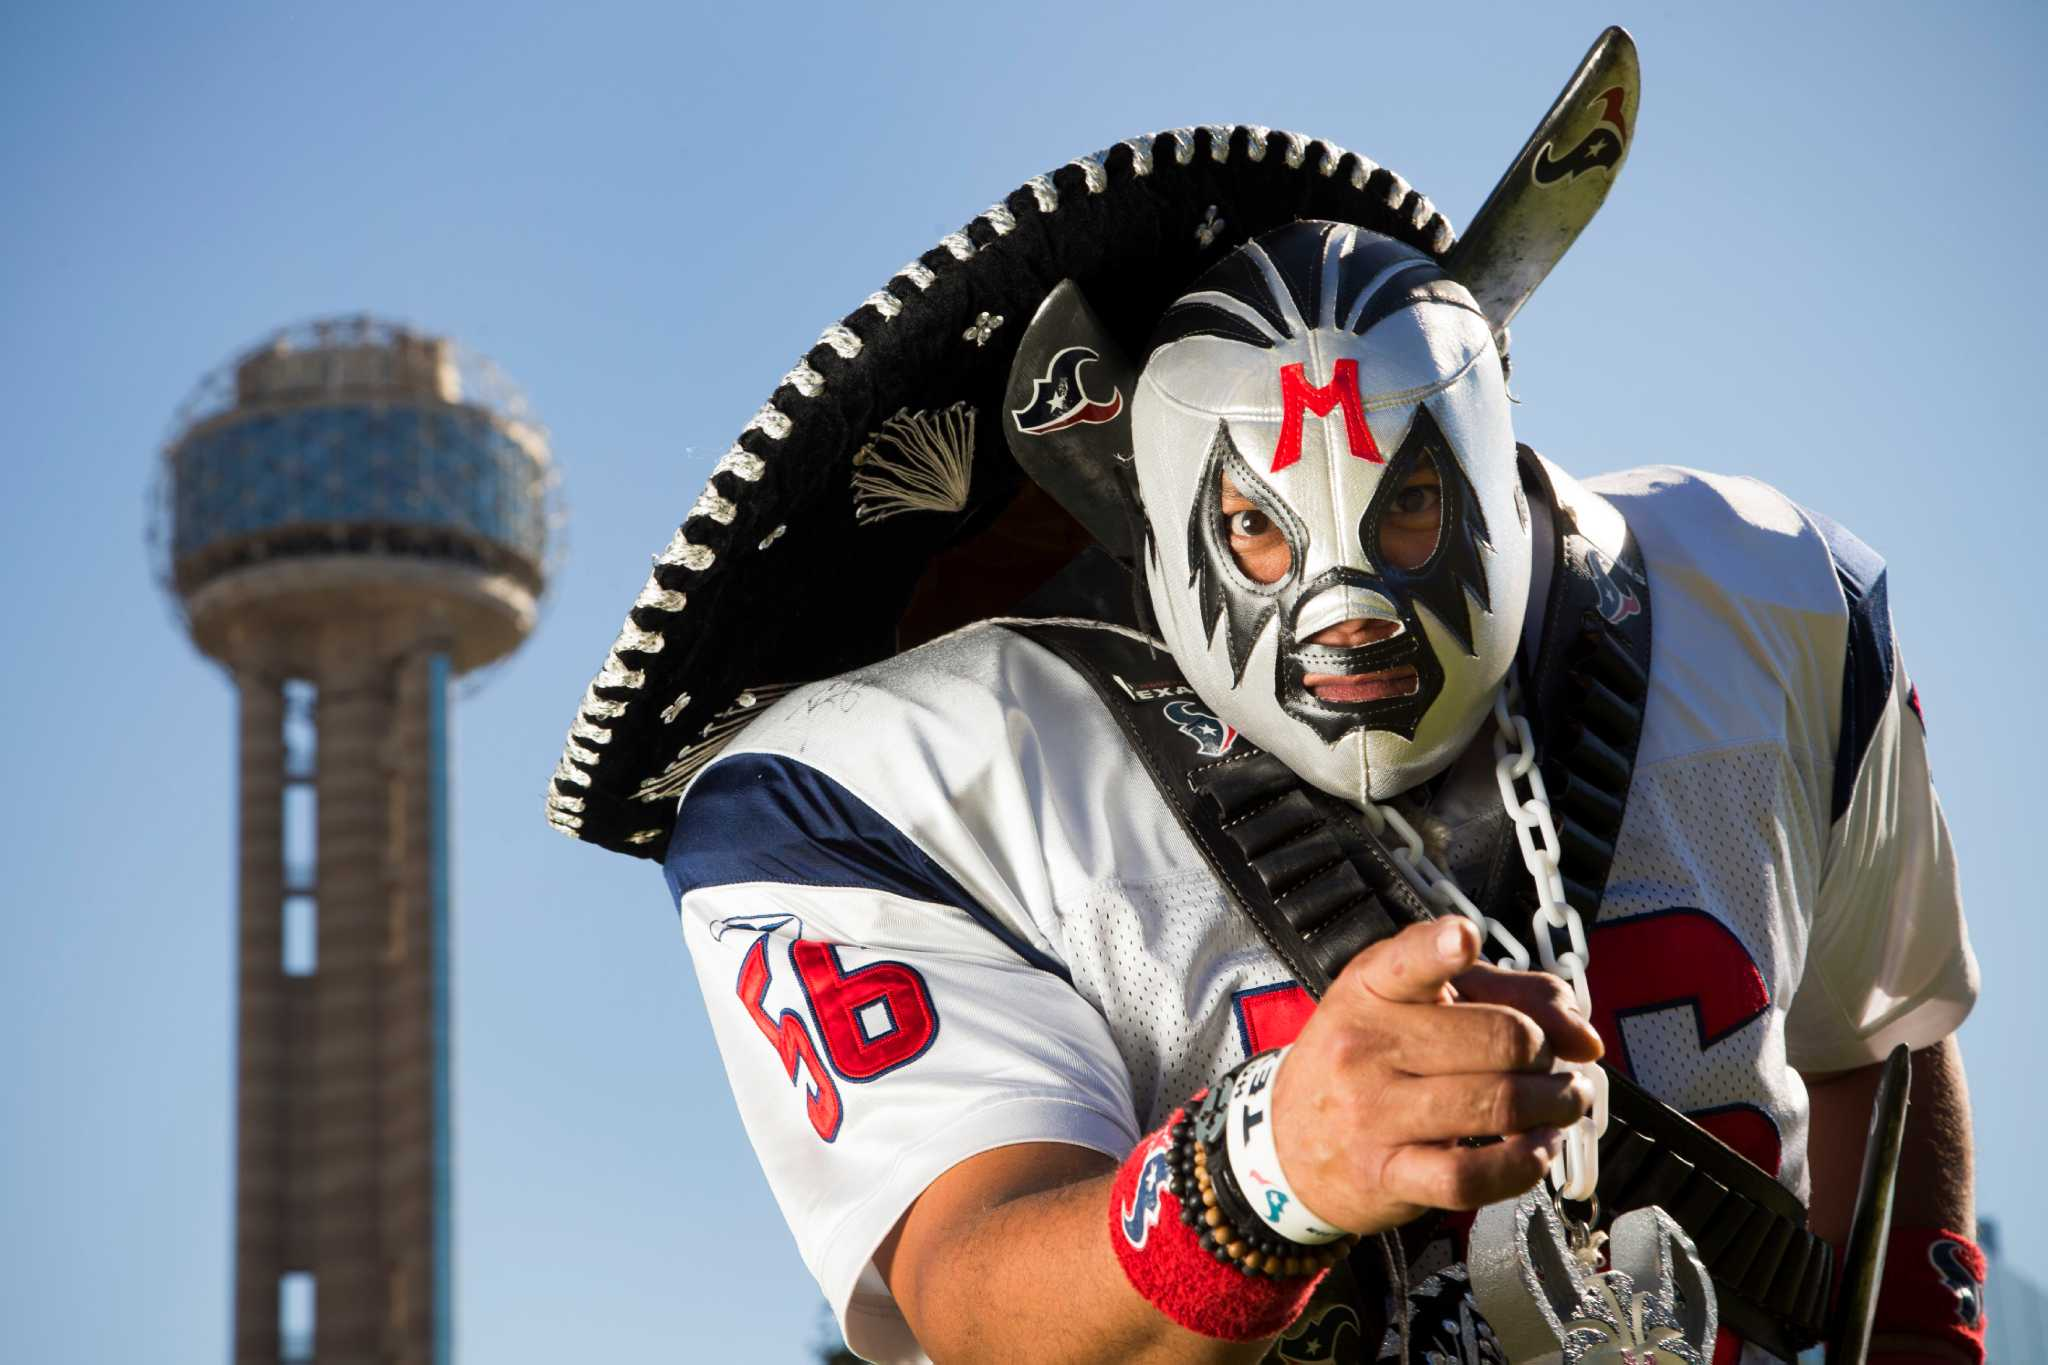 & Texans Cowboys renew bitter I-45 rivalry - HoustonChronicle.com